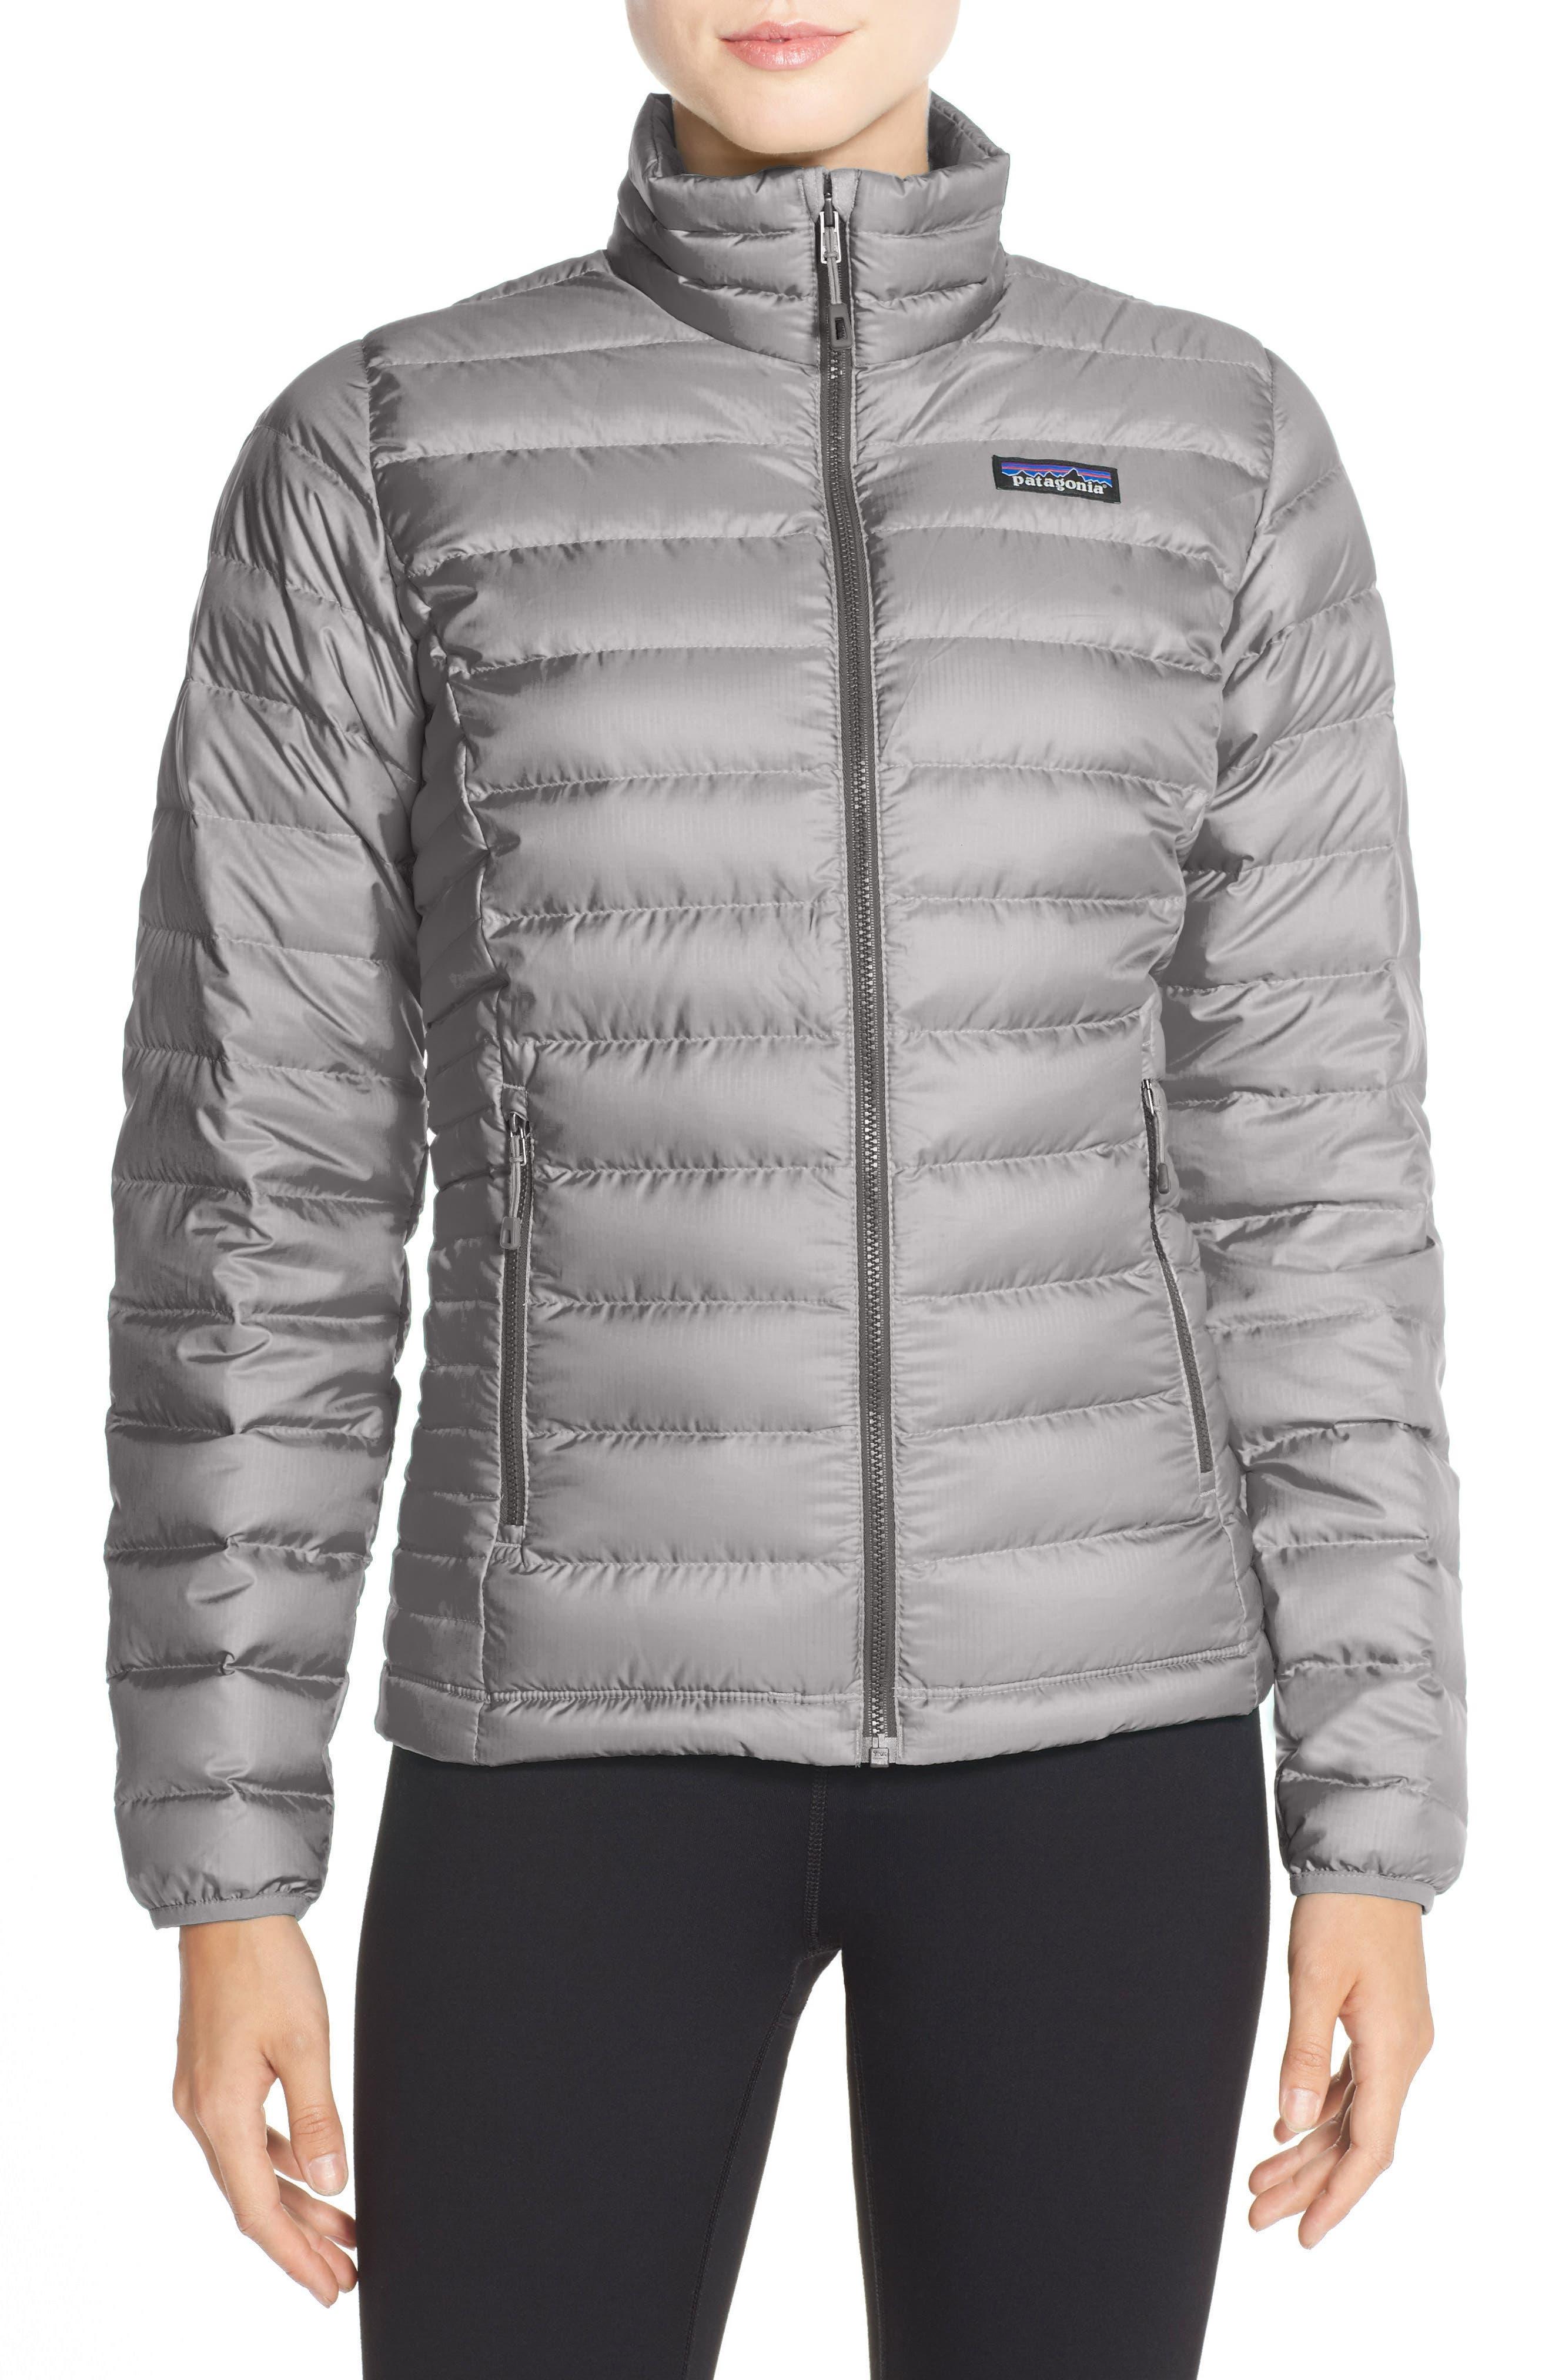 Alternate Image 1 Selected - Patagonia Packable Down Jacket